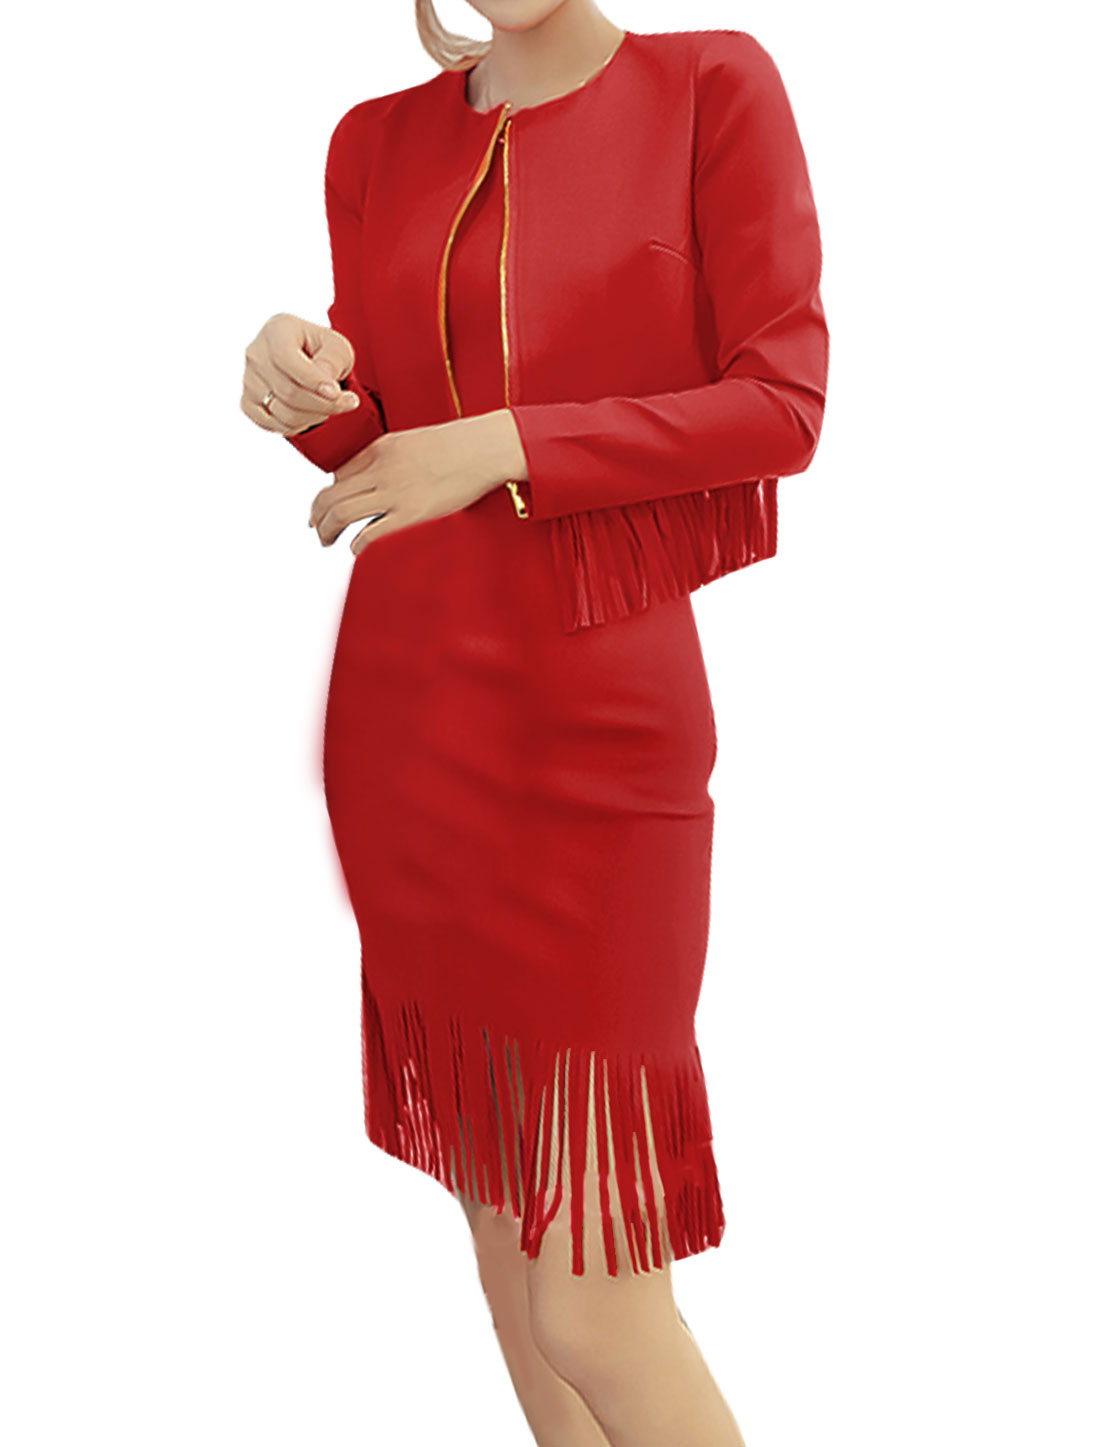 Women Zip Up Crop Jacket w Sleeveless Tassel Sheath Dress Sets Red XS